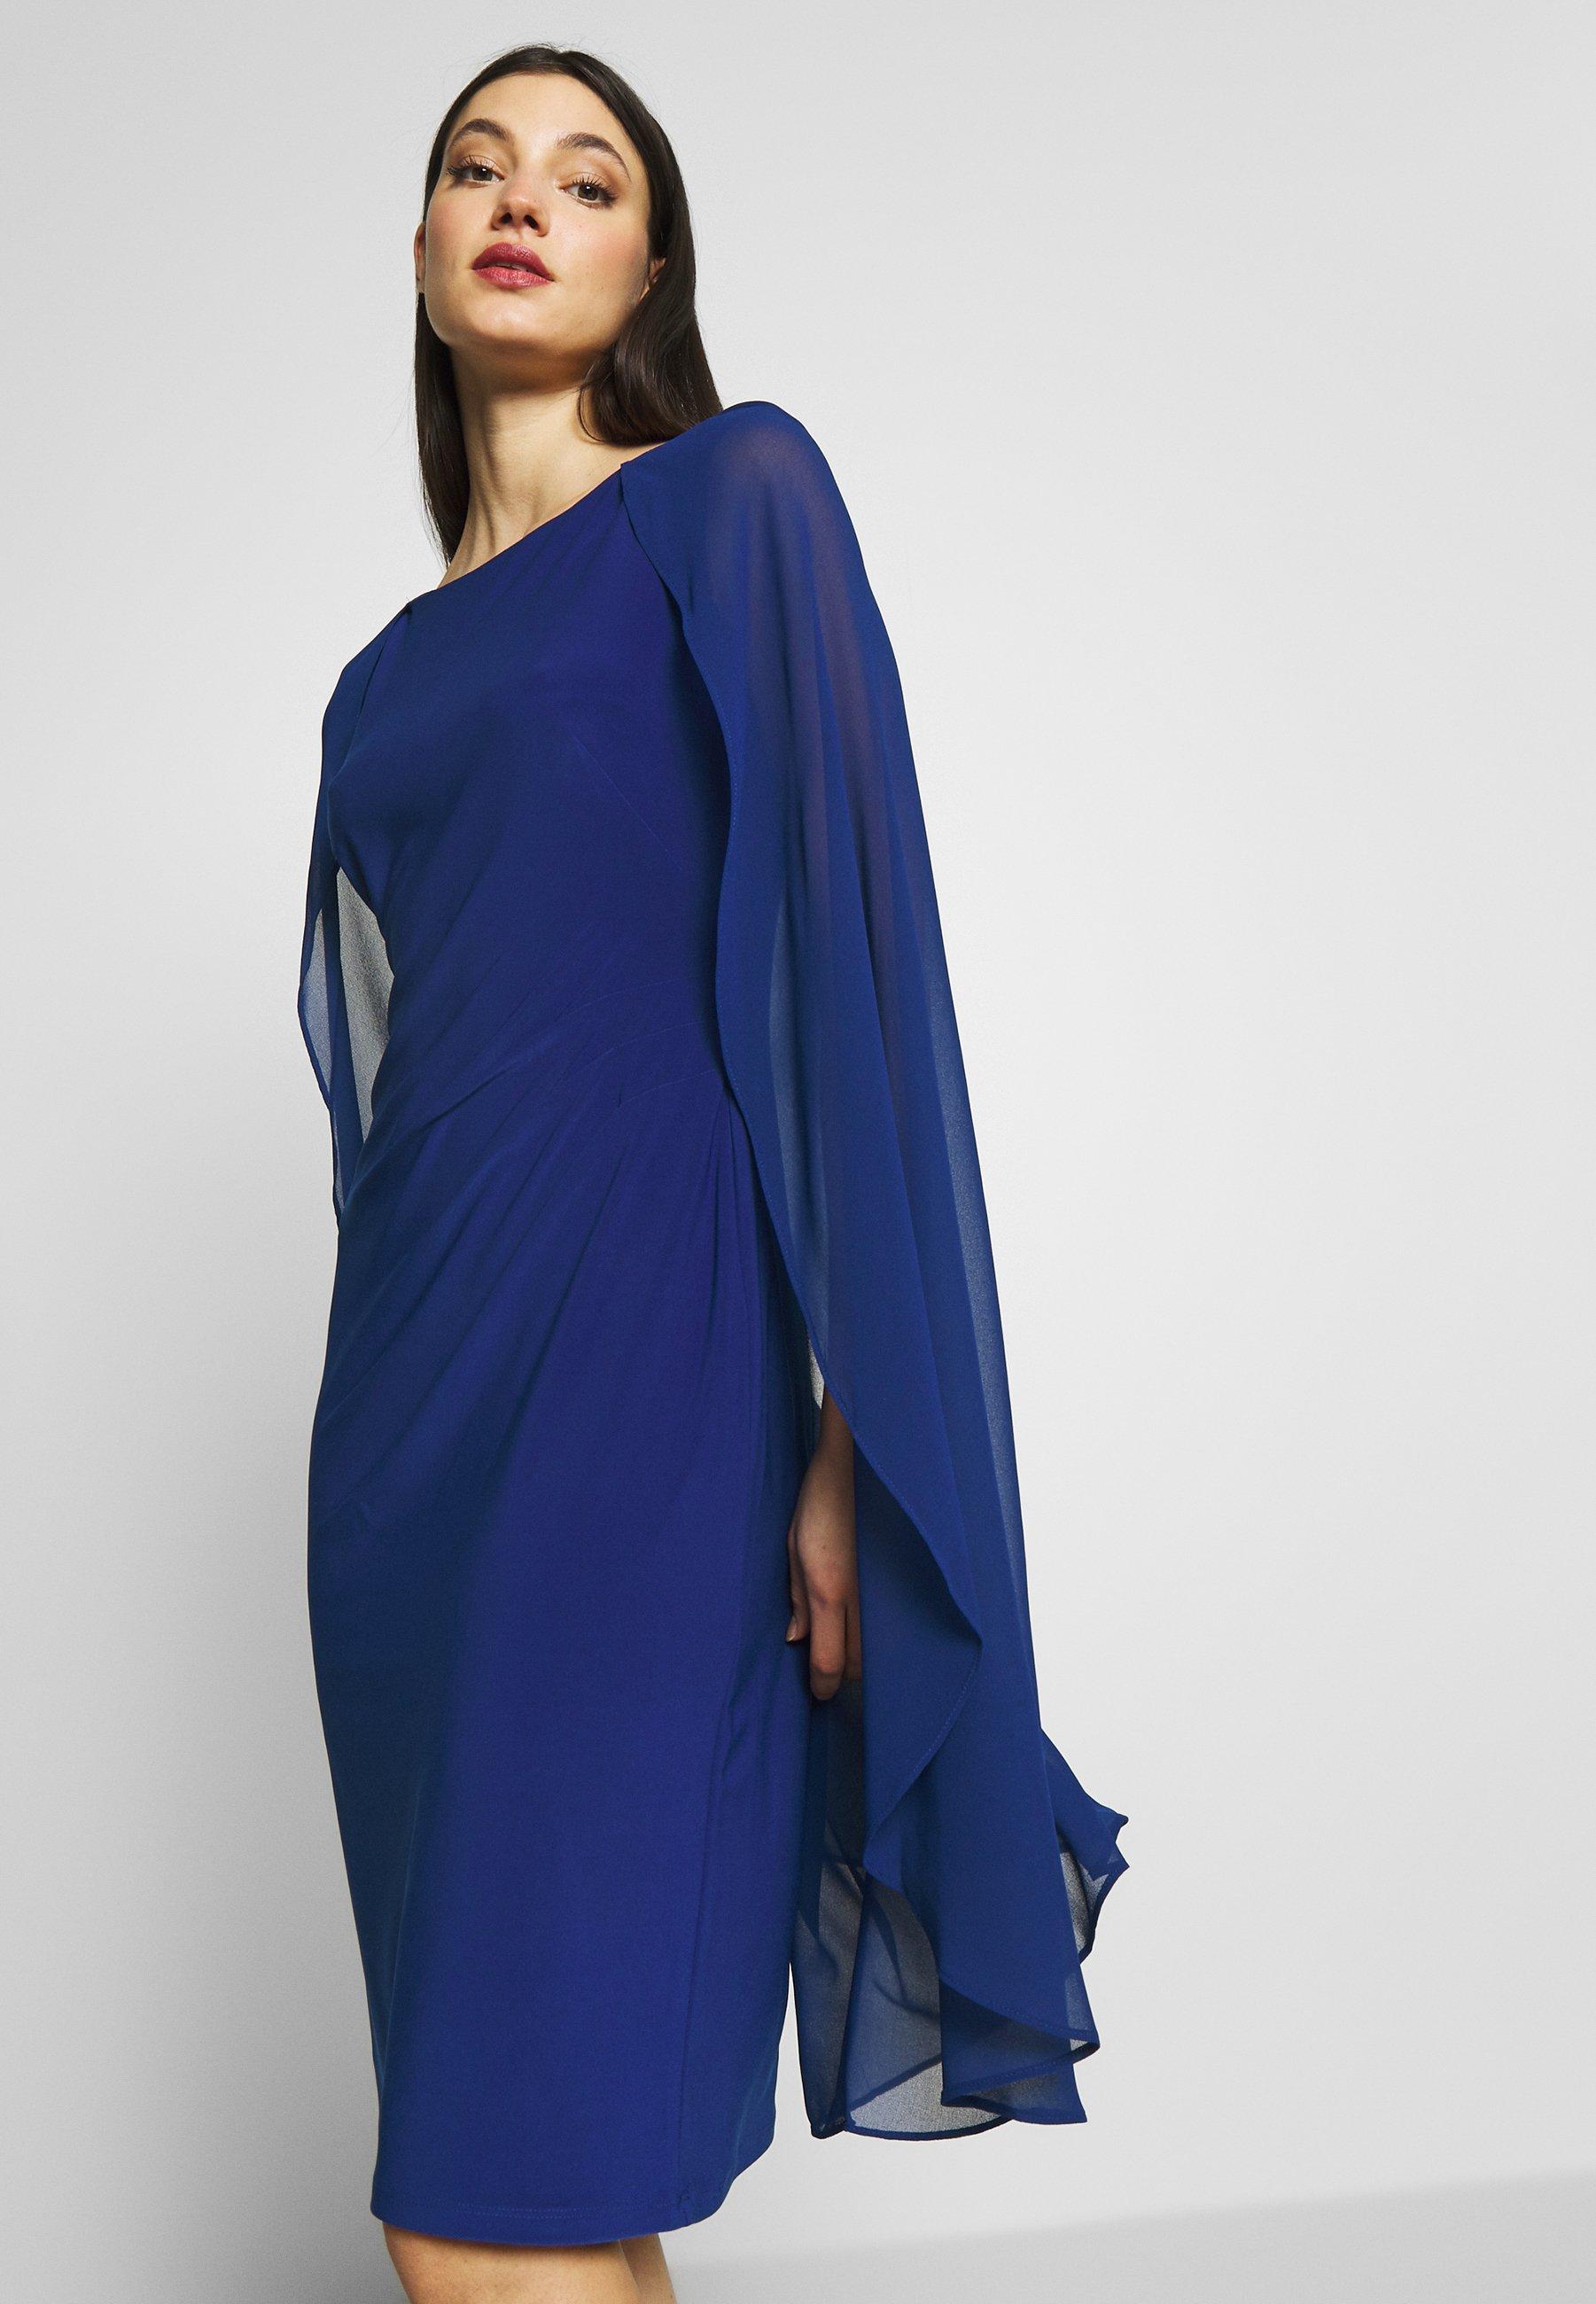 Lauren Ralph Lauren Classic Dress Combo Cocktailkleid Festliches Kleid Parisian Blue Blau Zalando De